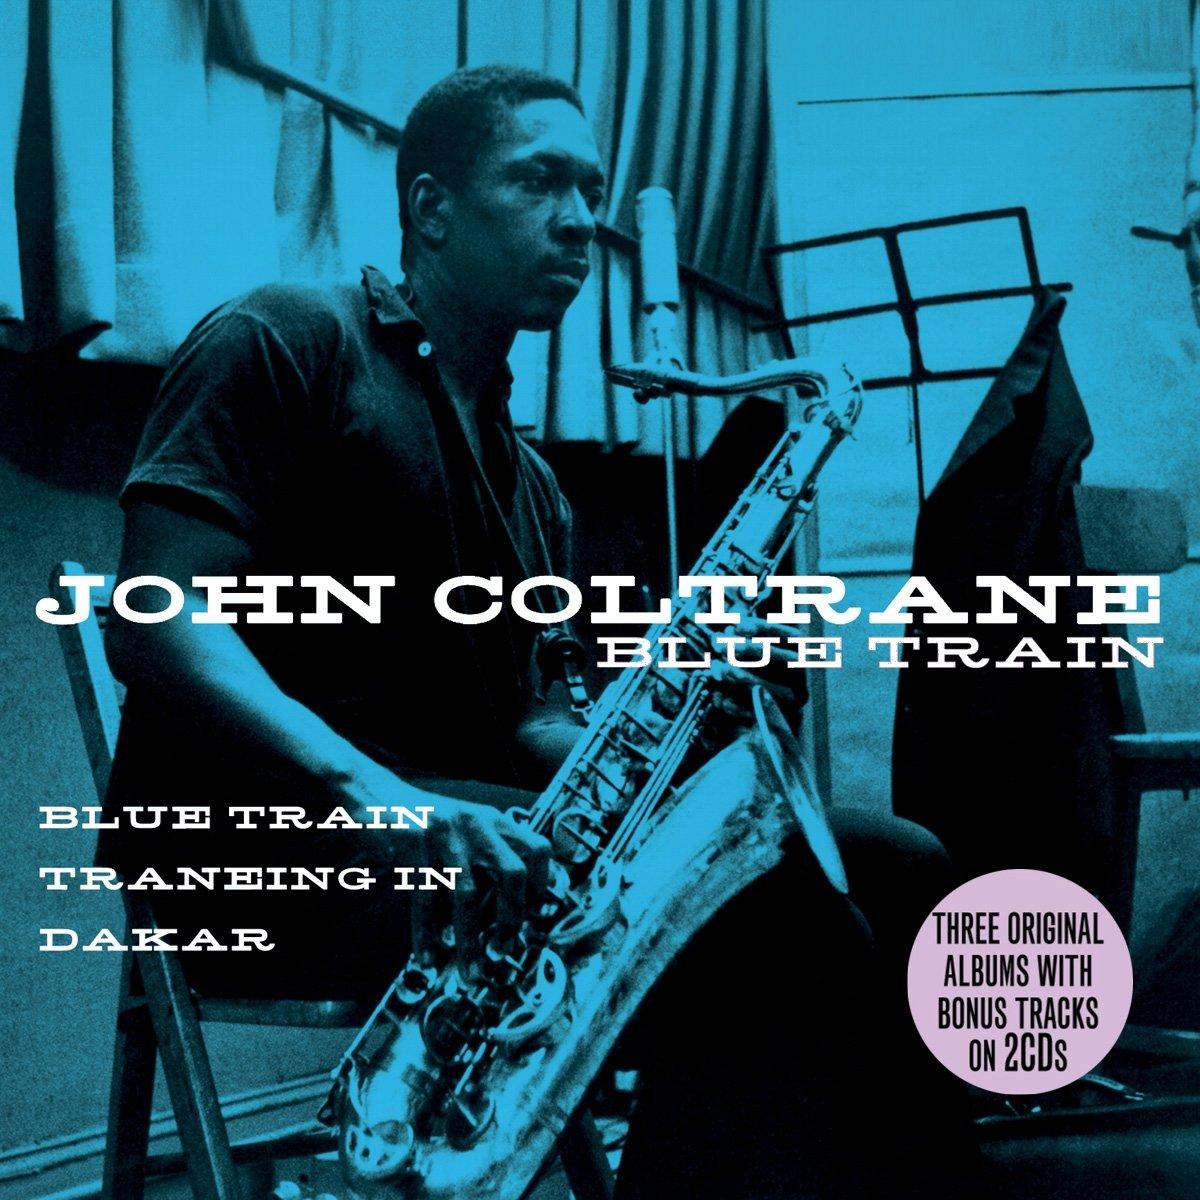 John Coltrane - Blue Train   CD kopen